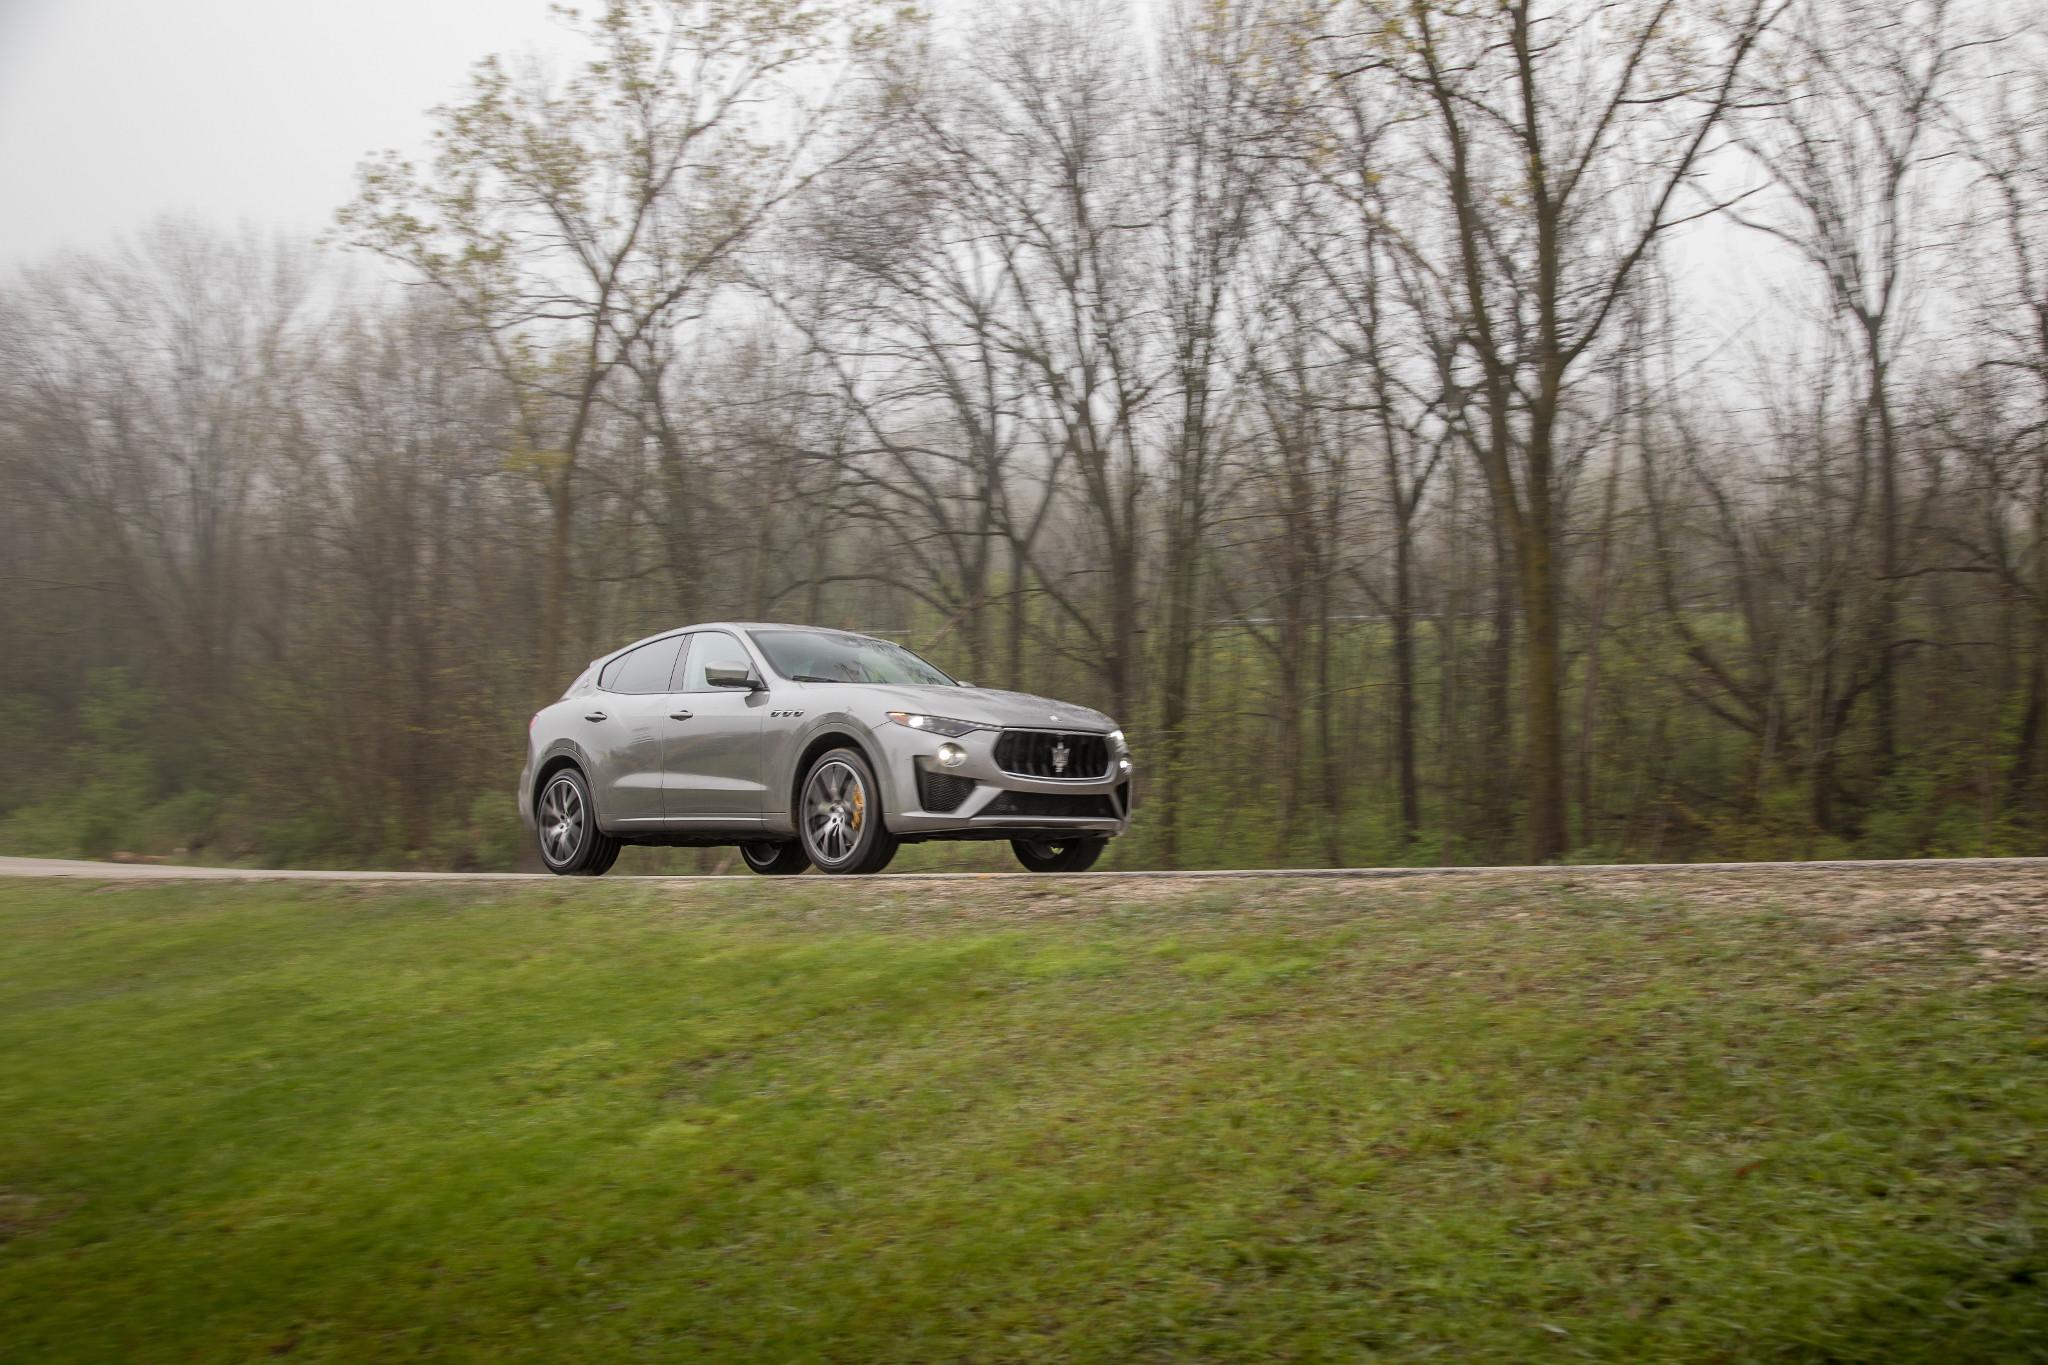 2019 Maserati Levante Video: Plenty of Sport, Lots of Utility